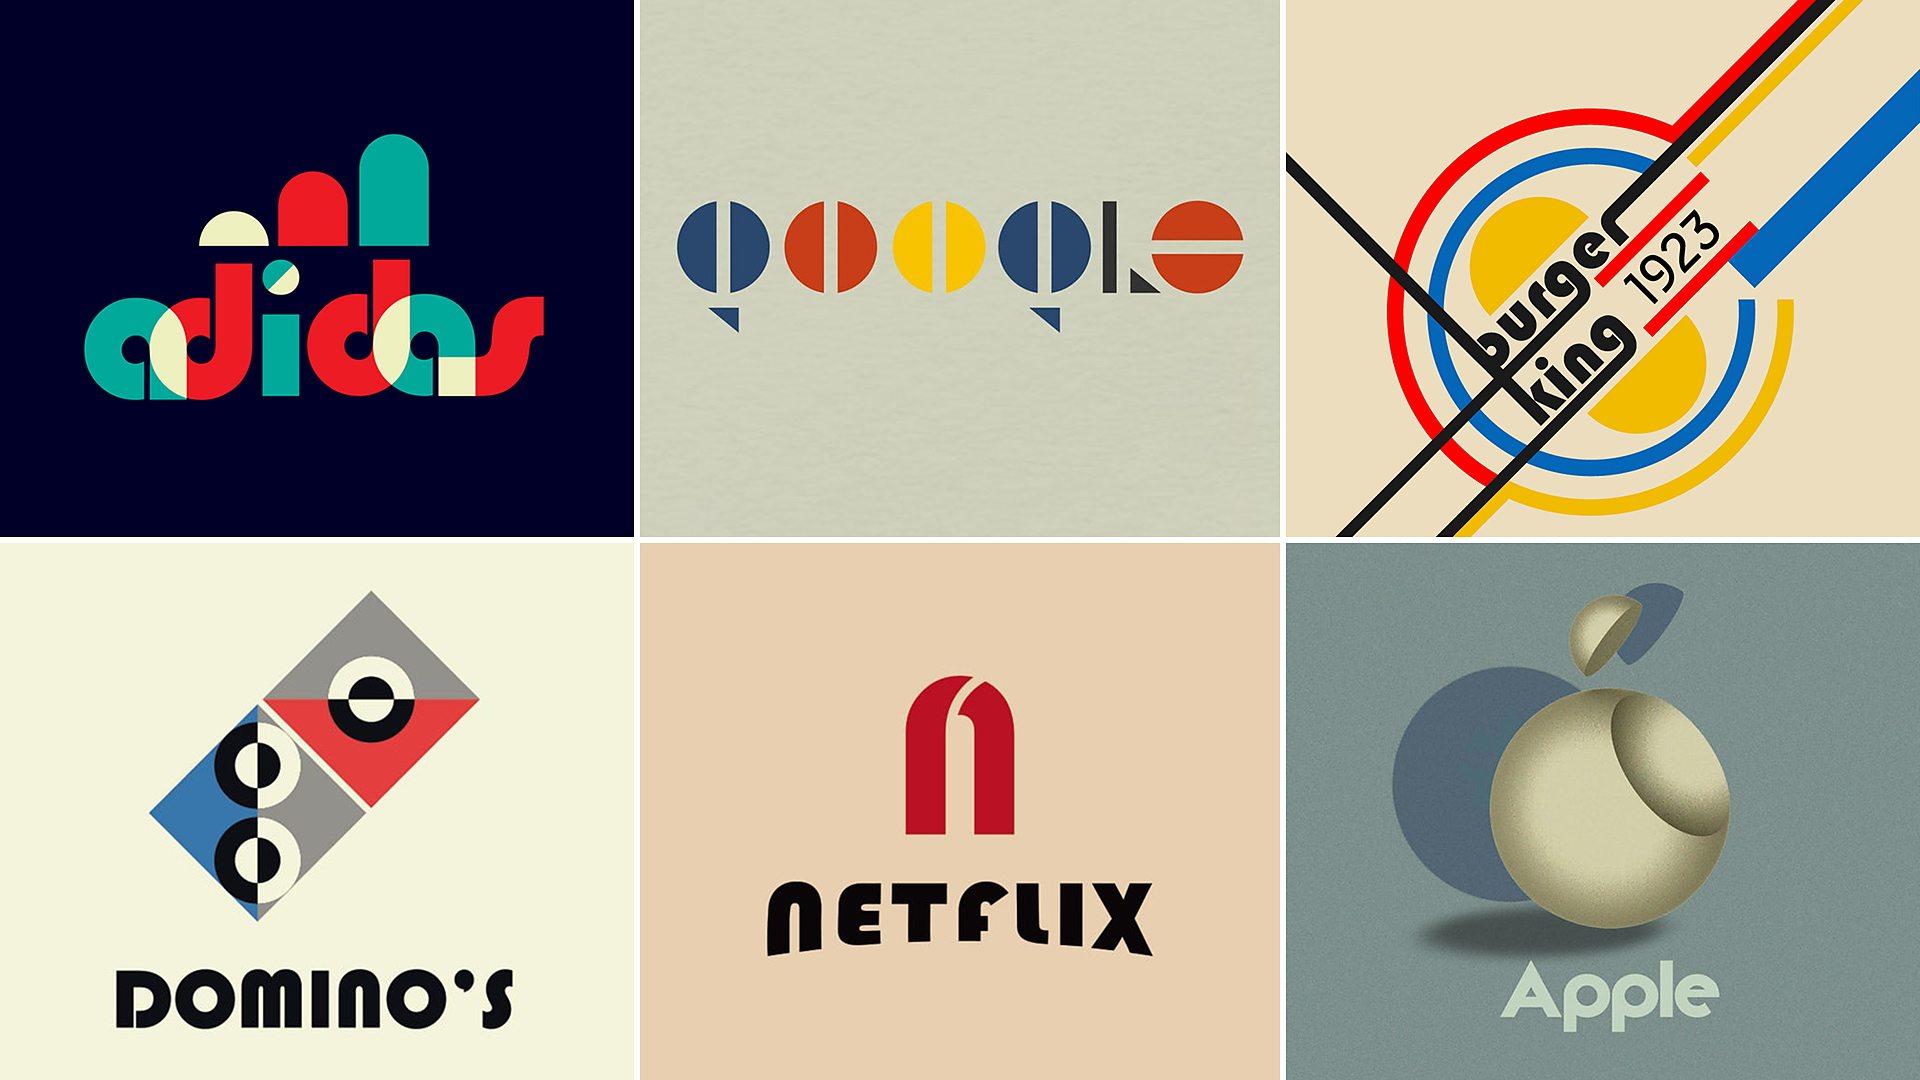 BBC Arts - BBC Arts - 'Haus work: Famous logos redesigned to mark Bauhaus centenary